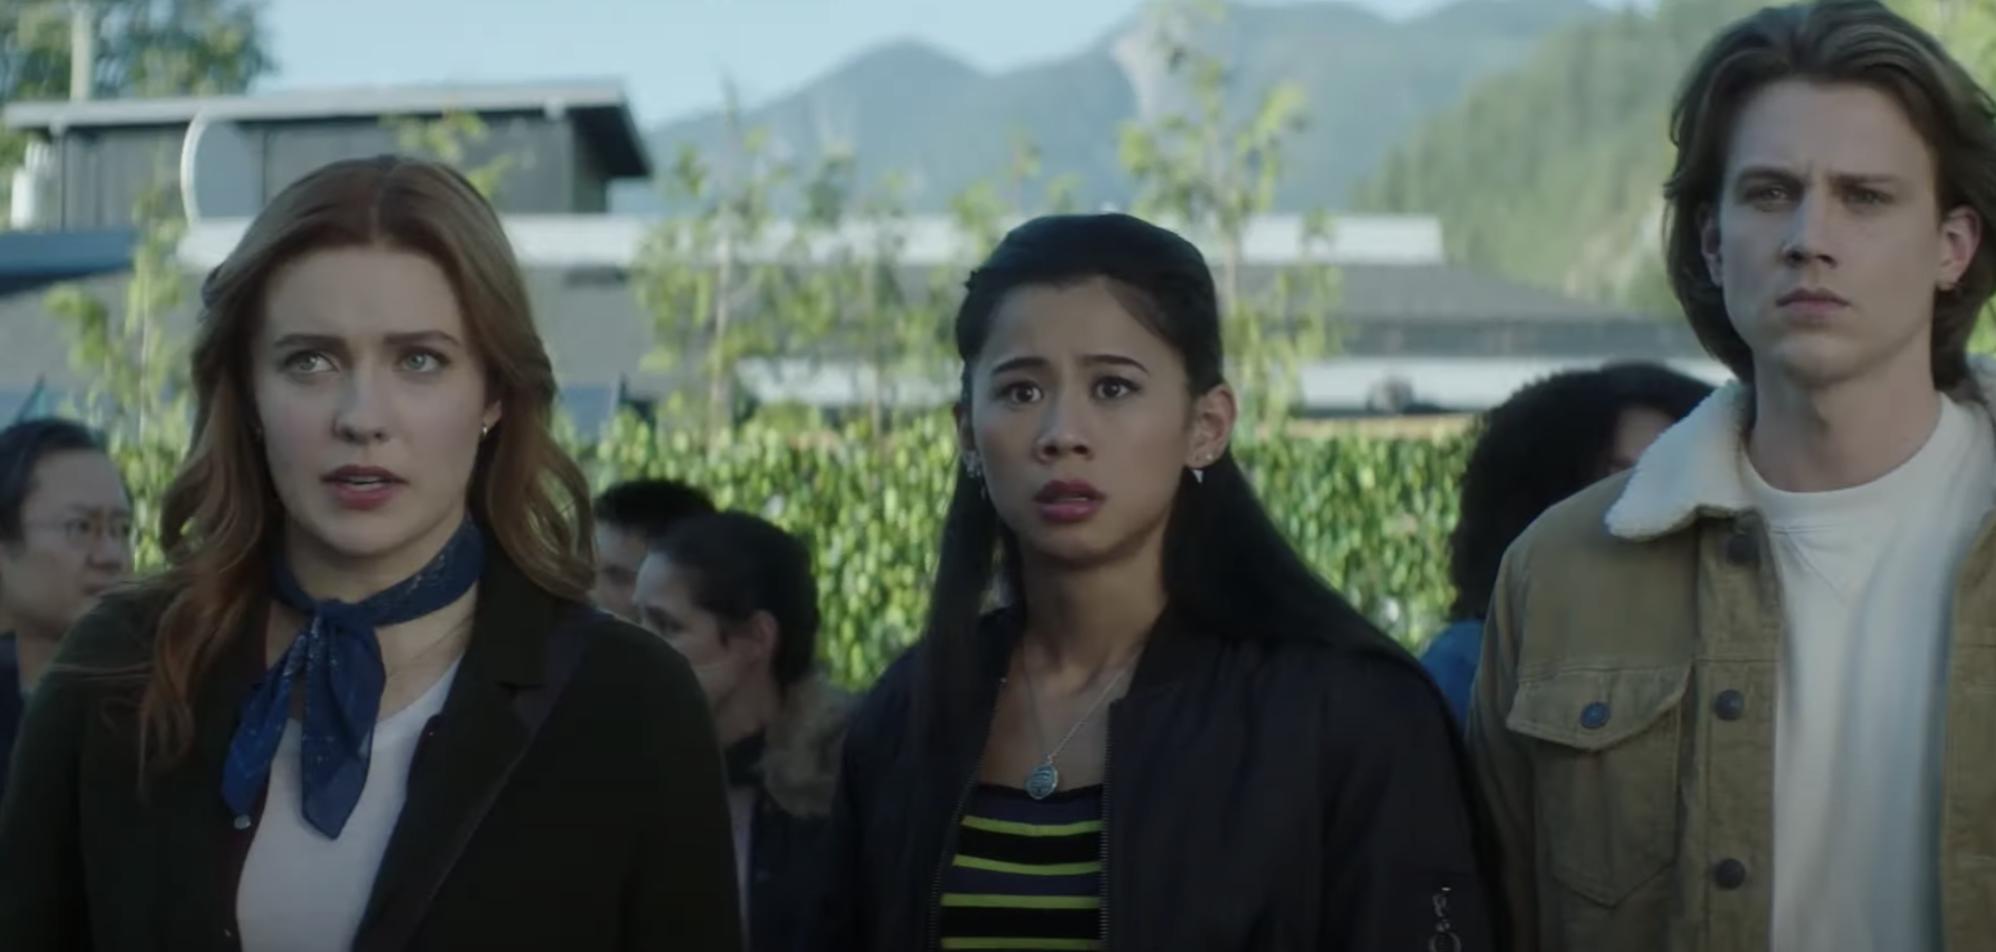 WATCH: 'Nancy Drew' Season 3 Trailer Teases Nancy and Ace Romance